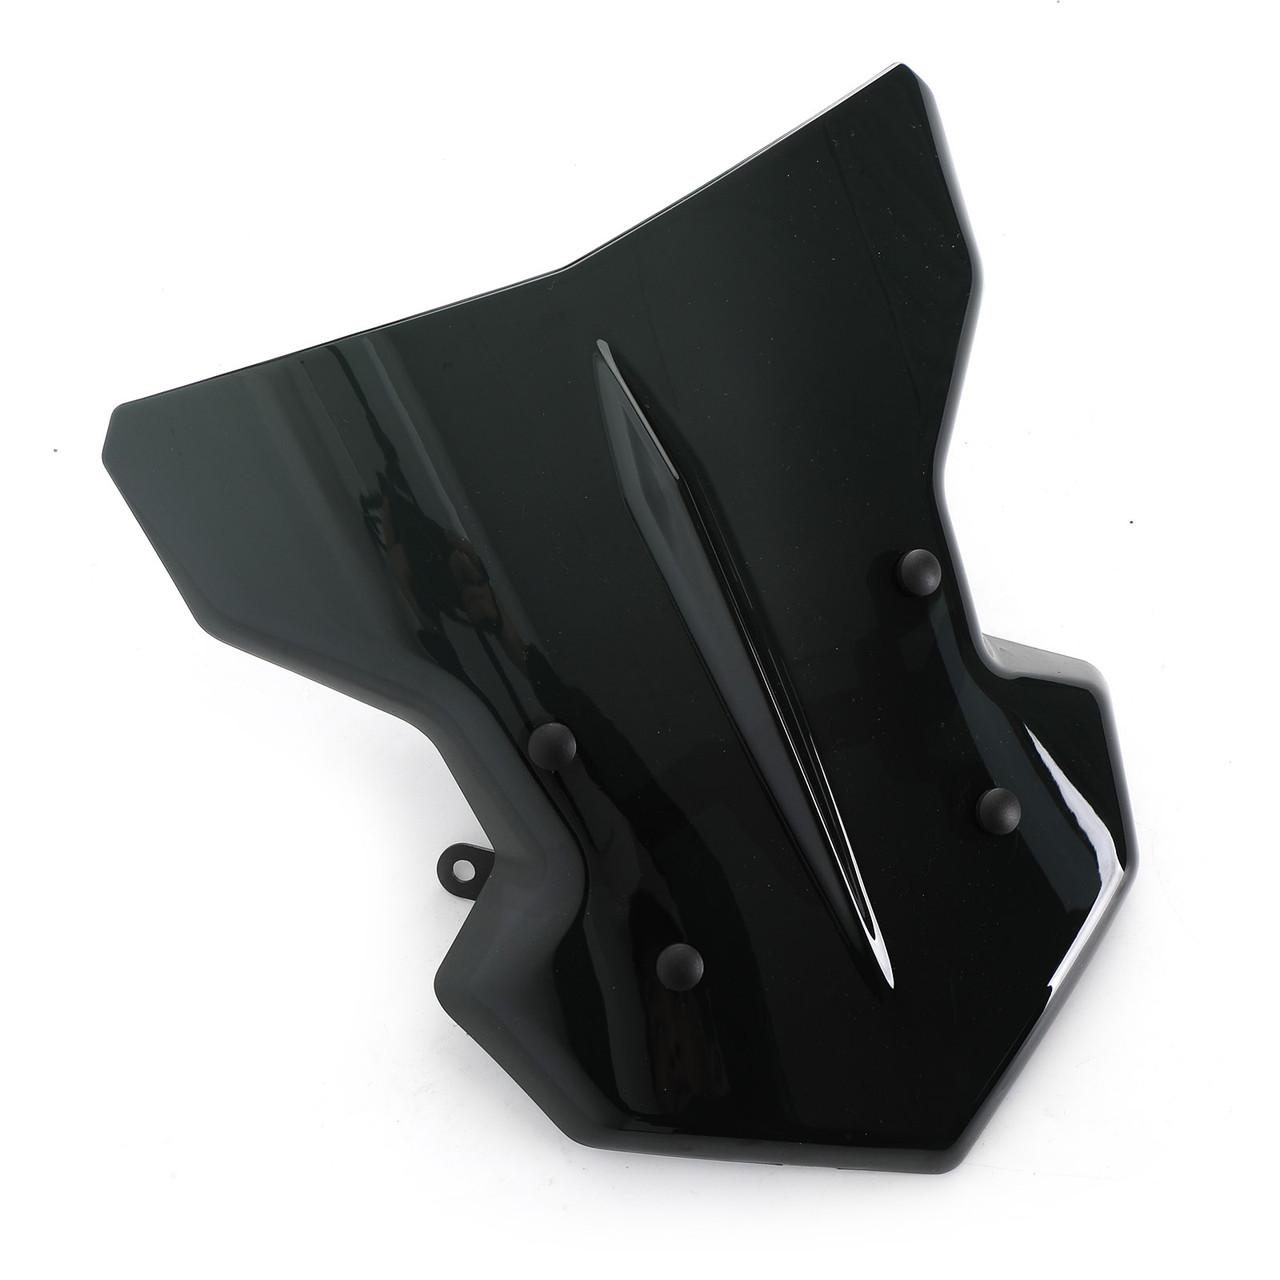 Windshield Fits For Yamaha MT-03 2020 Black